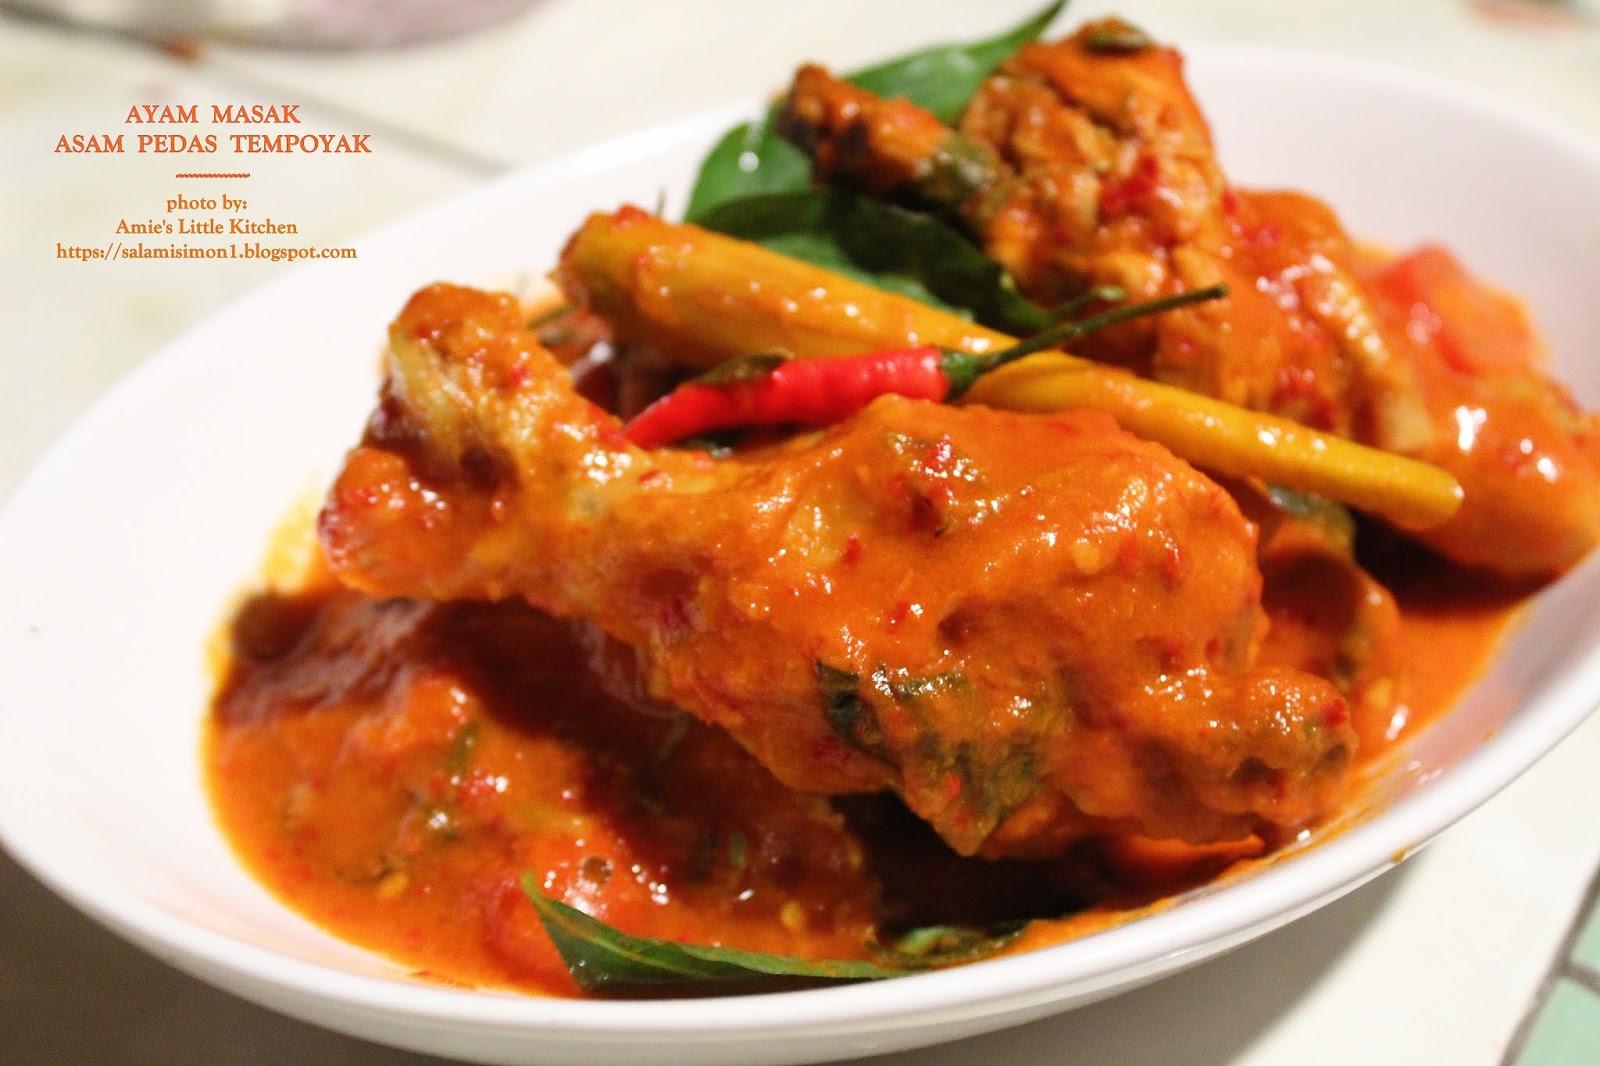 AMIE'S LITTLE KITCHEN: Cara Masak Asam Pedas Tempoyak Ayam